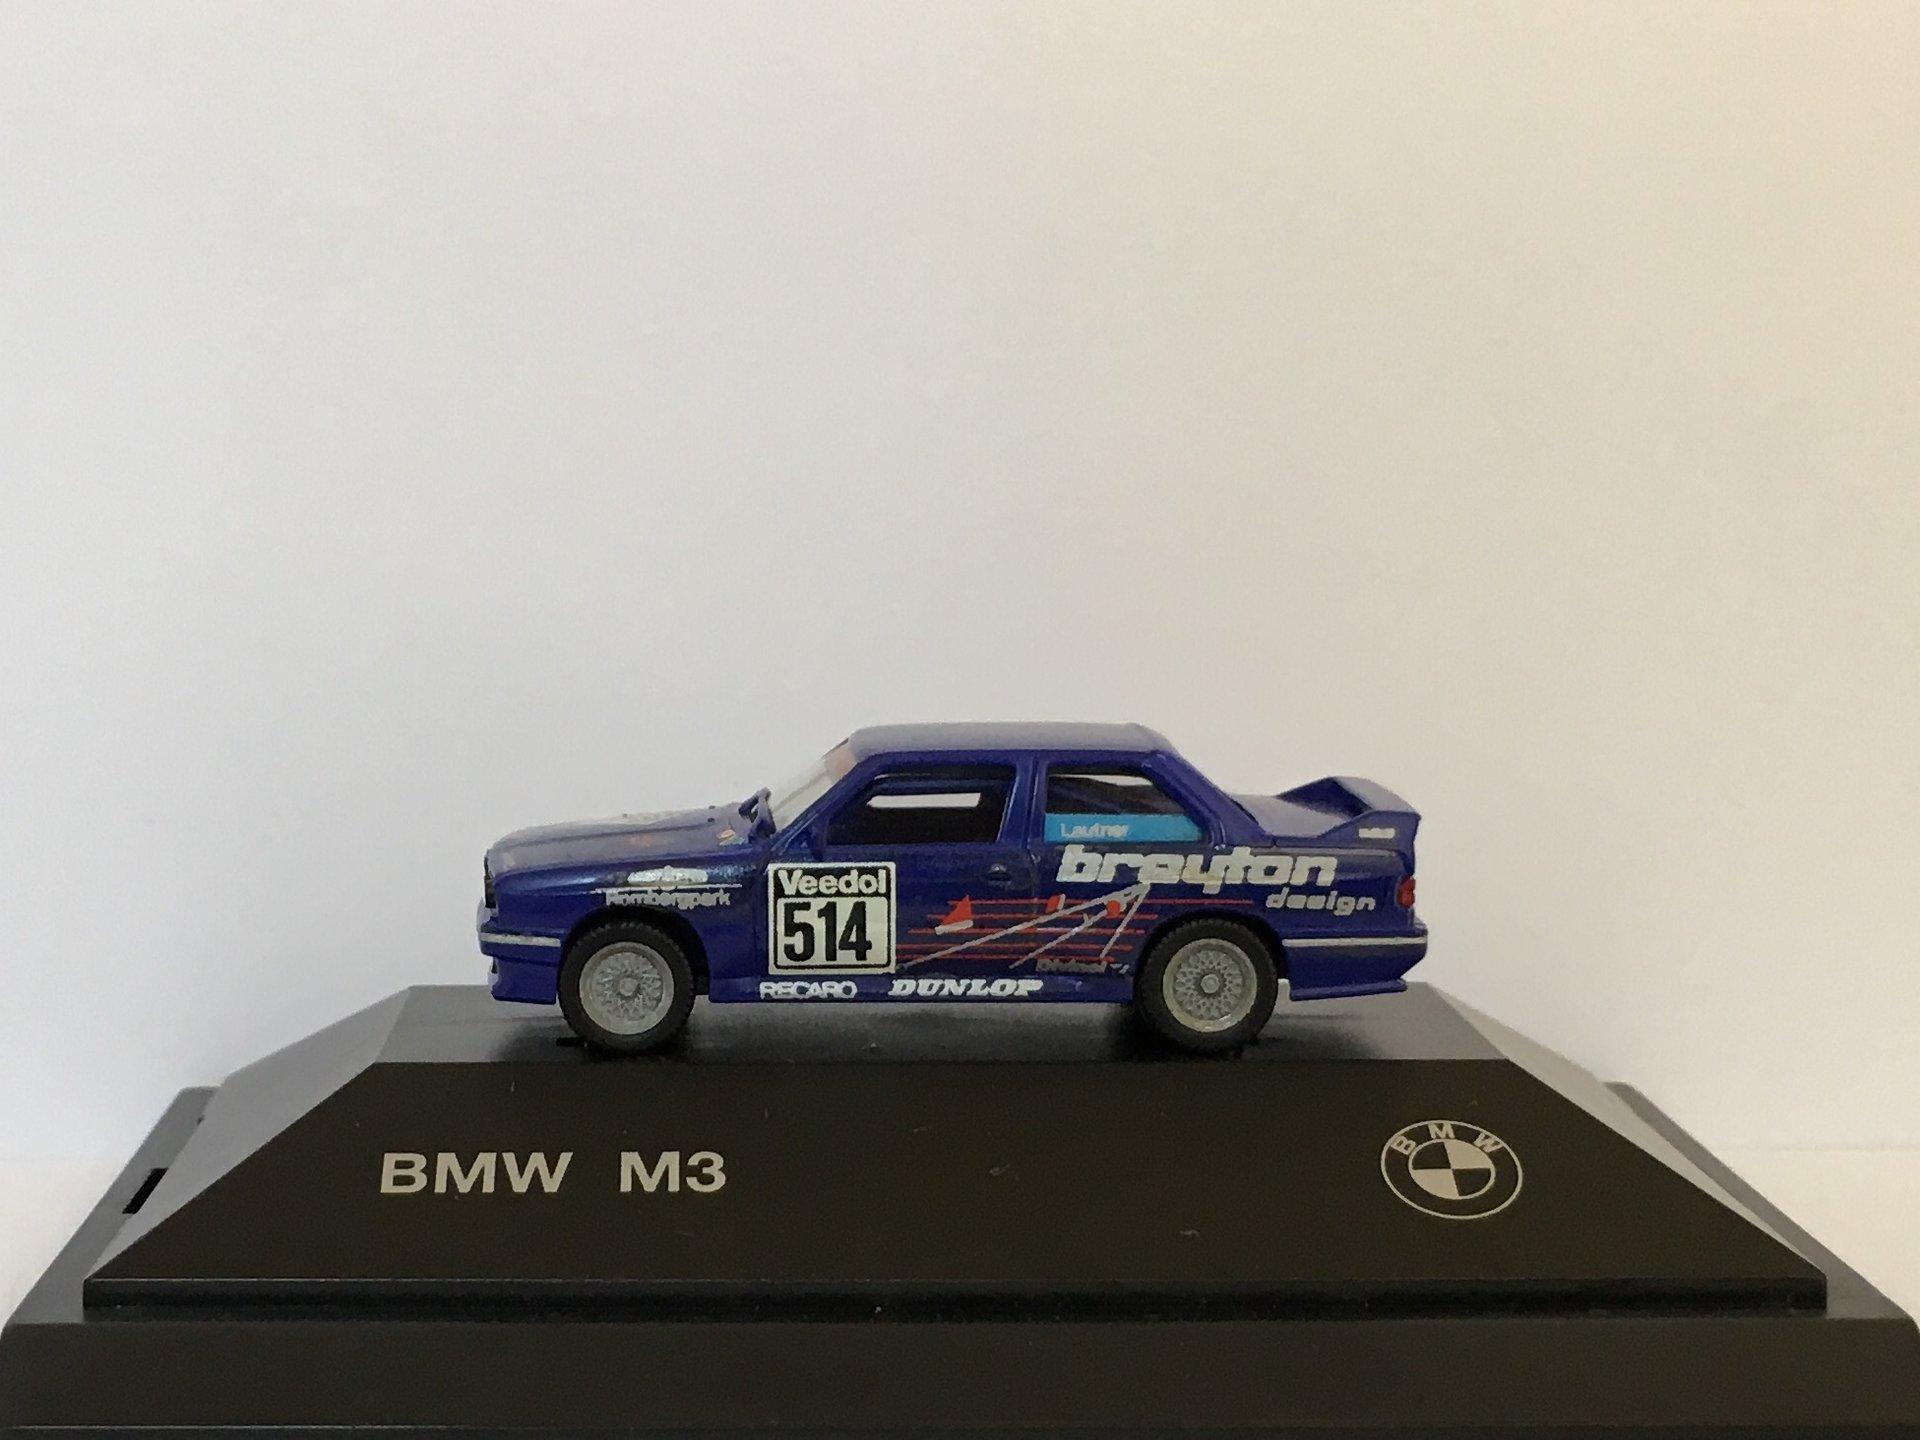 BMW M3 E30 No514 Brayton 001.jpg